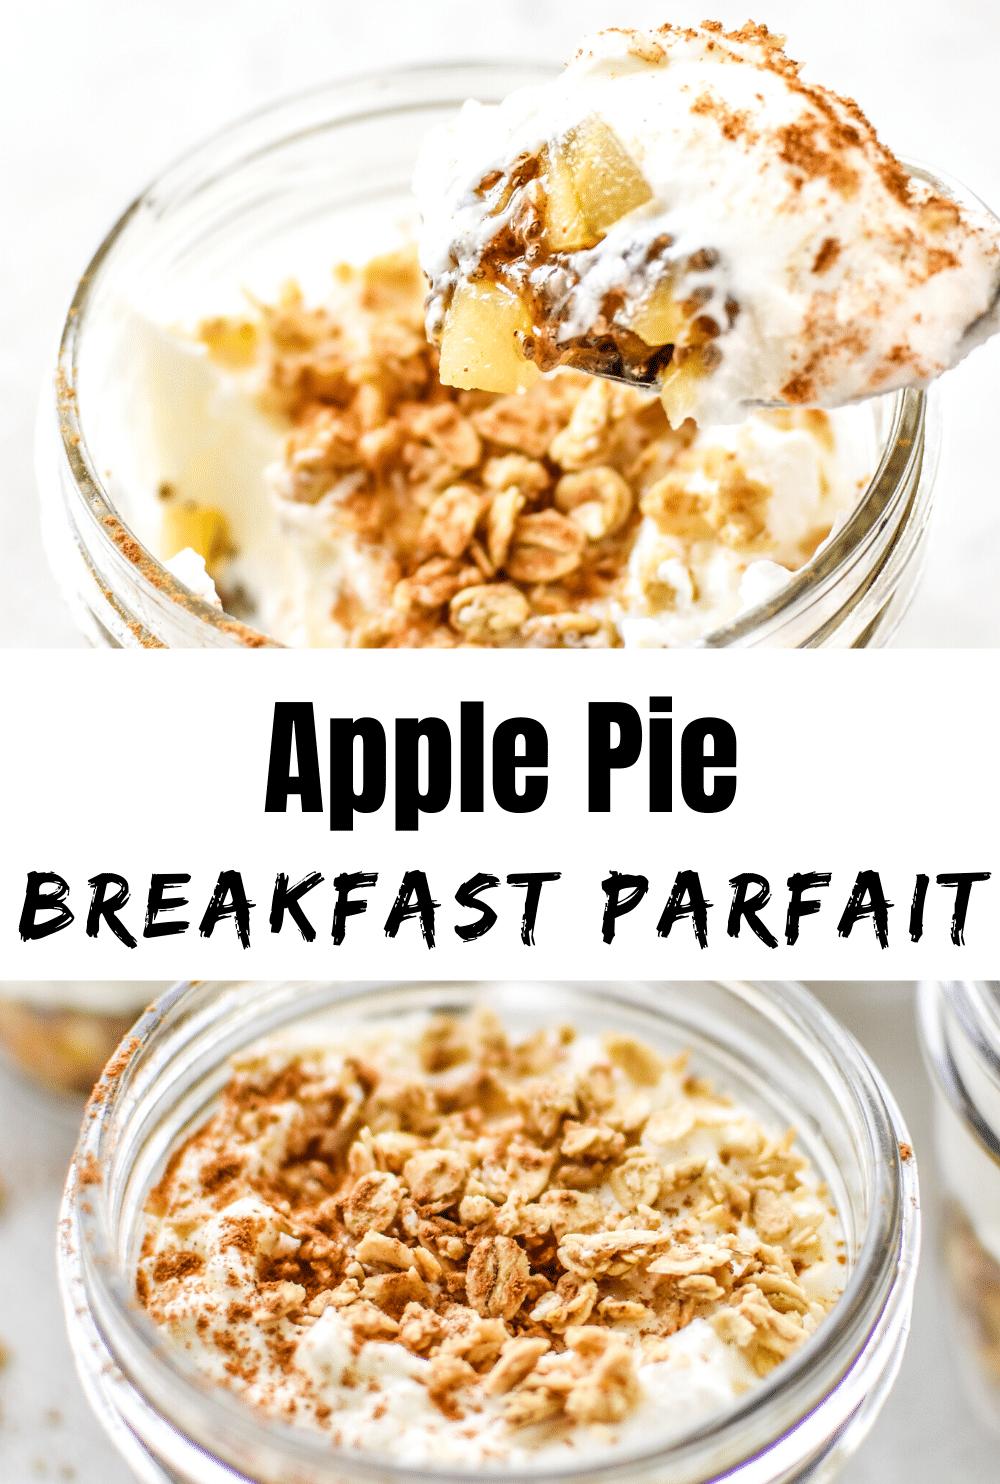 Apple Pie Breakfast Parfait